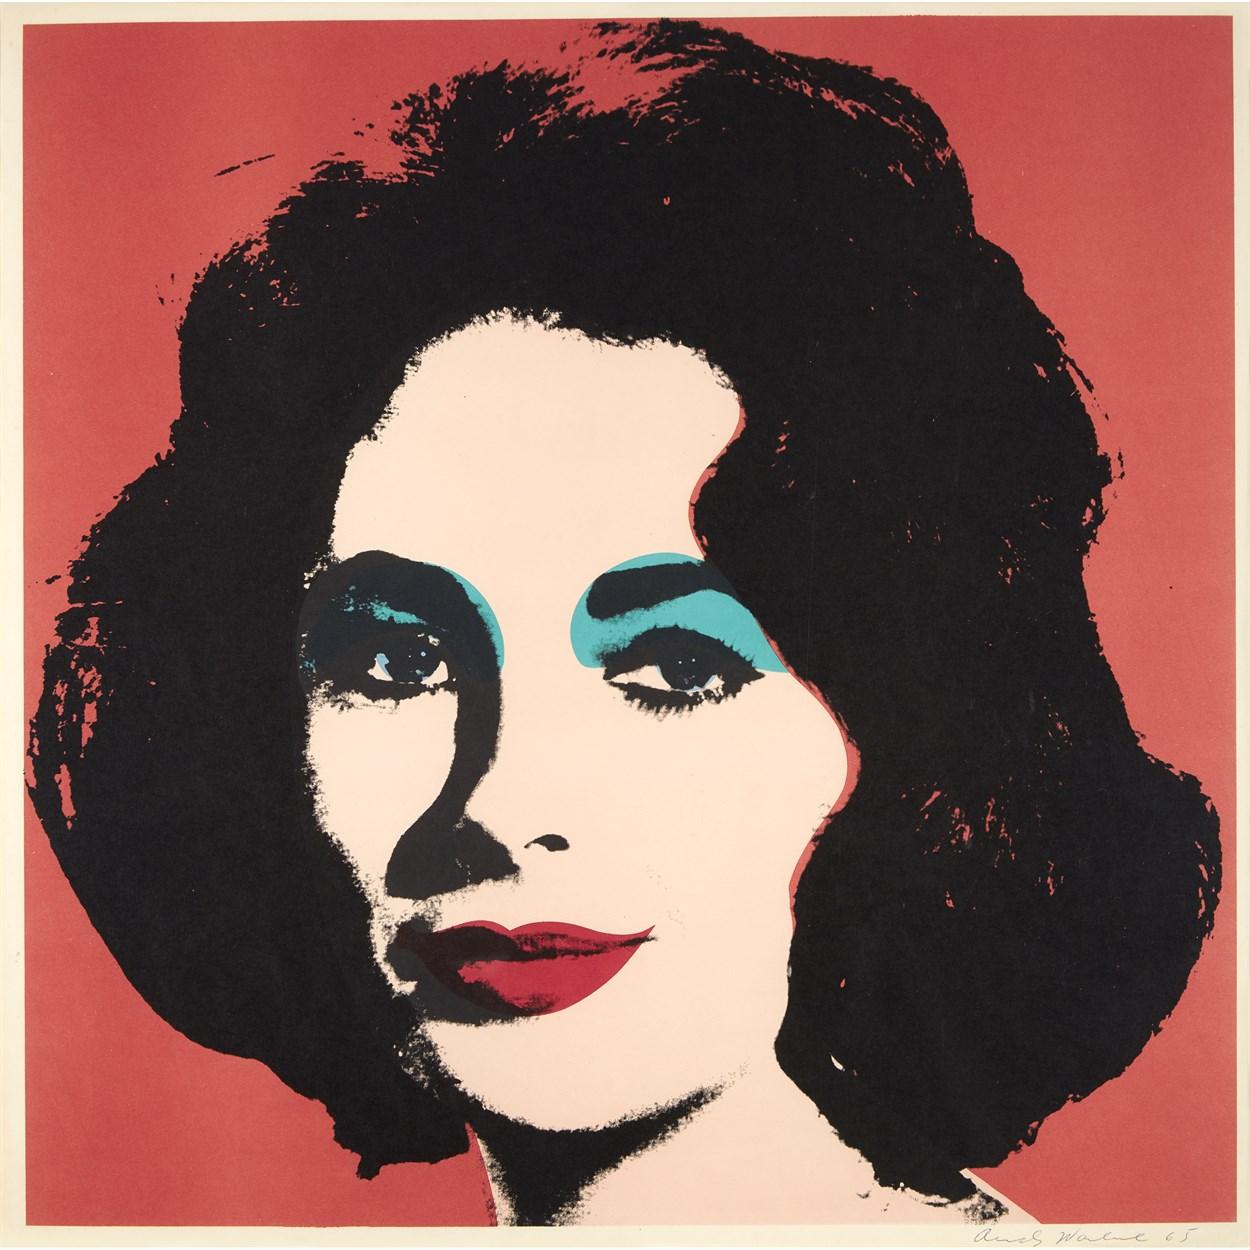 Lot 48 - Andy Warhol (American, 1928-1987)